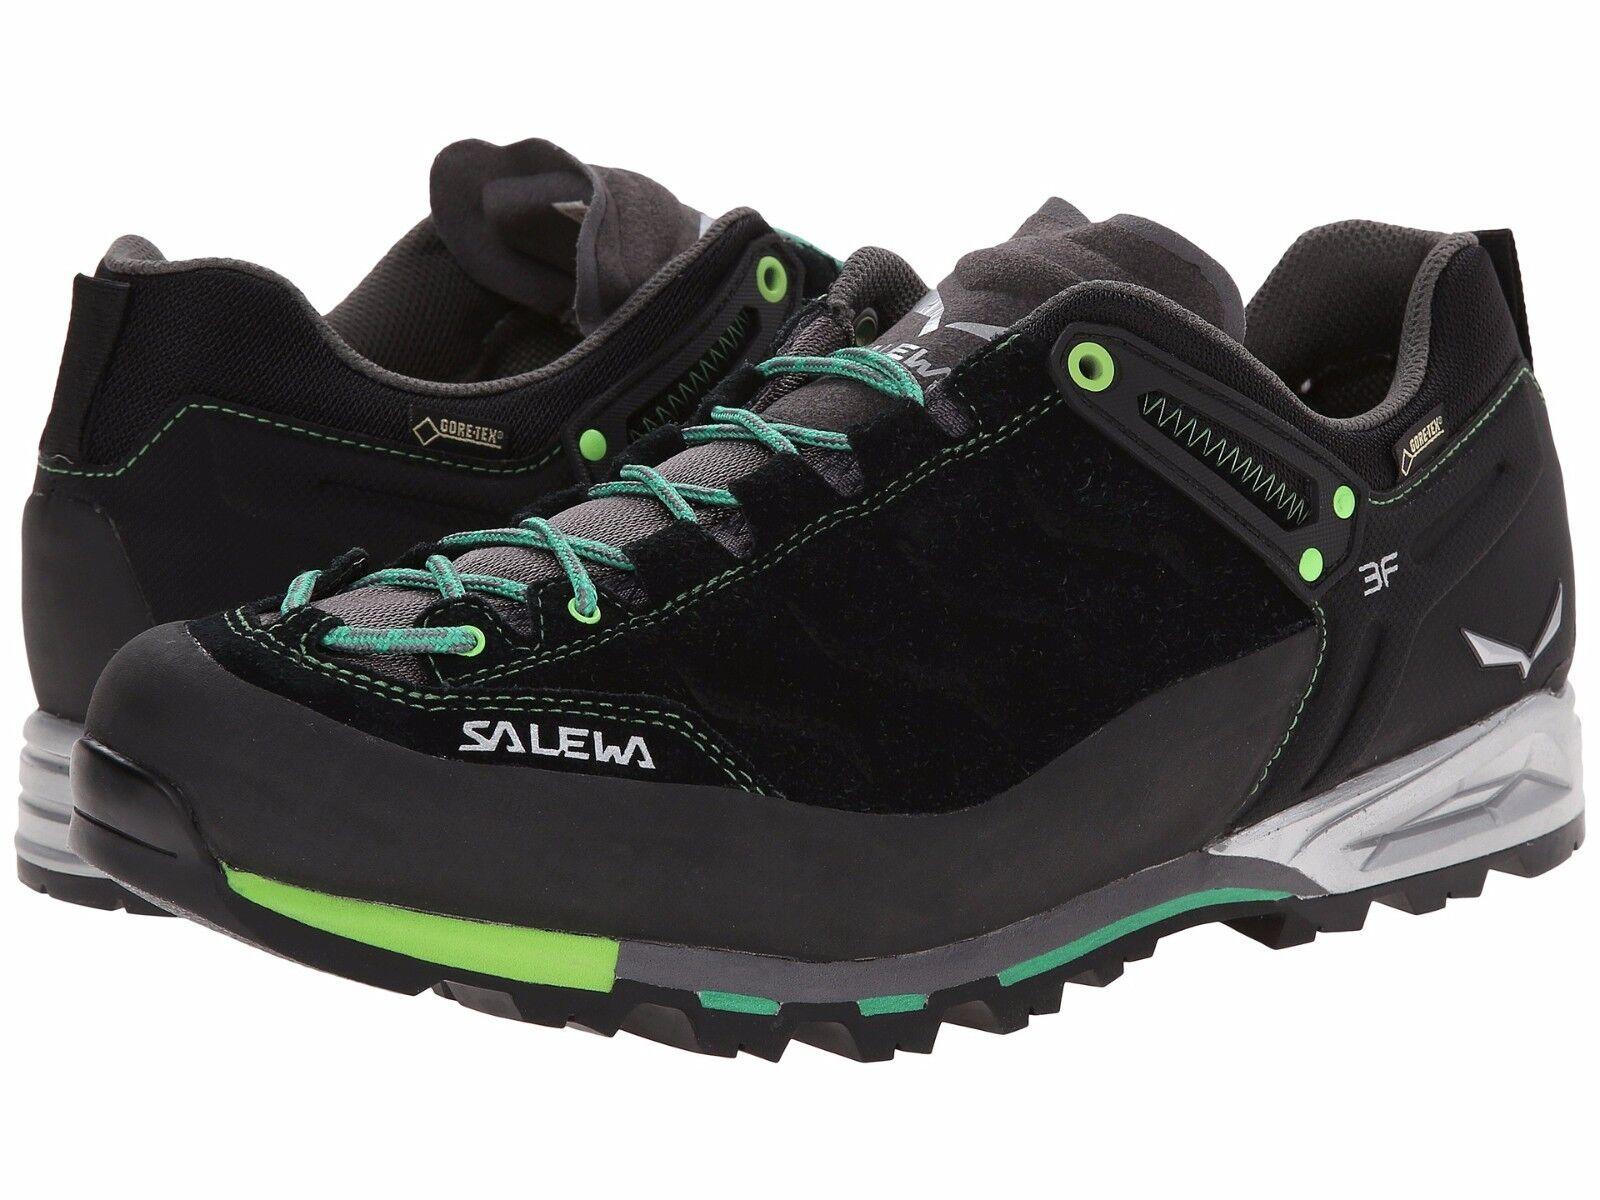 Salewa™ Men's Mountain Trainer GTX Hiking Shoe Size 7-12